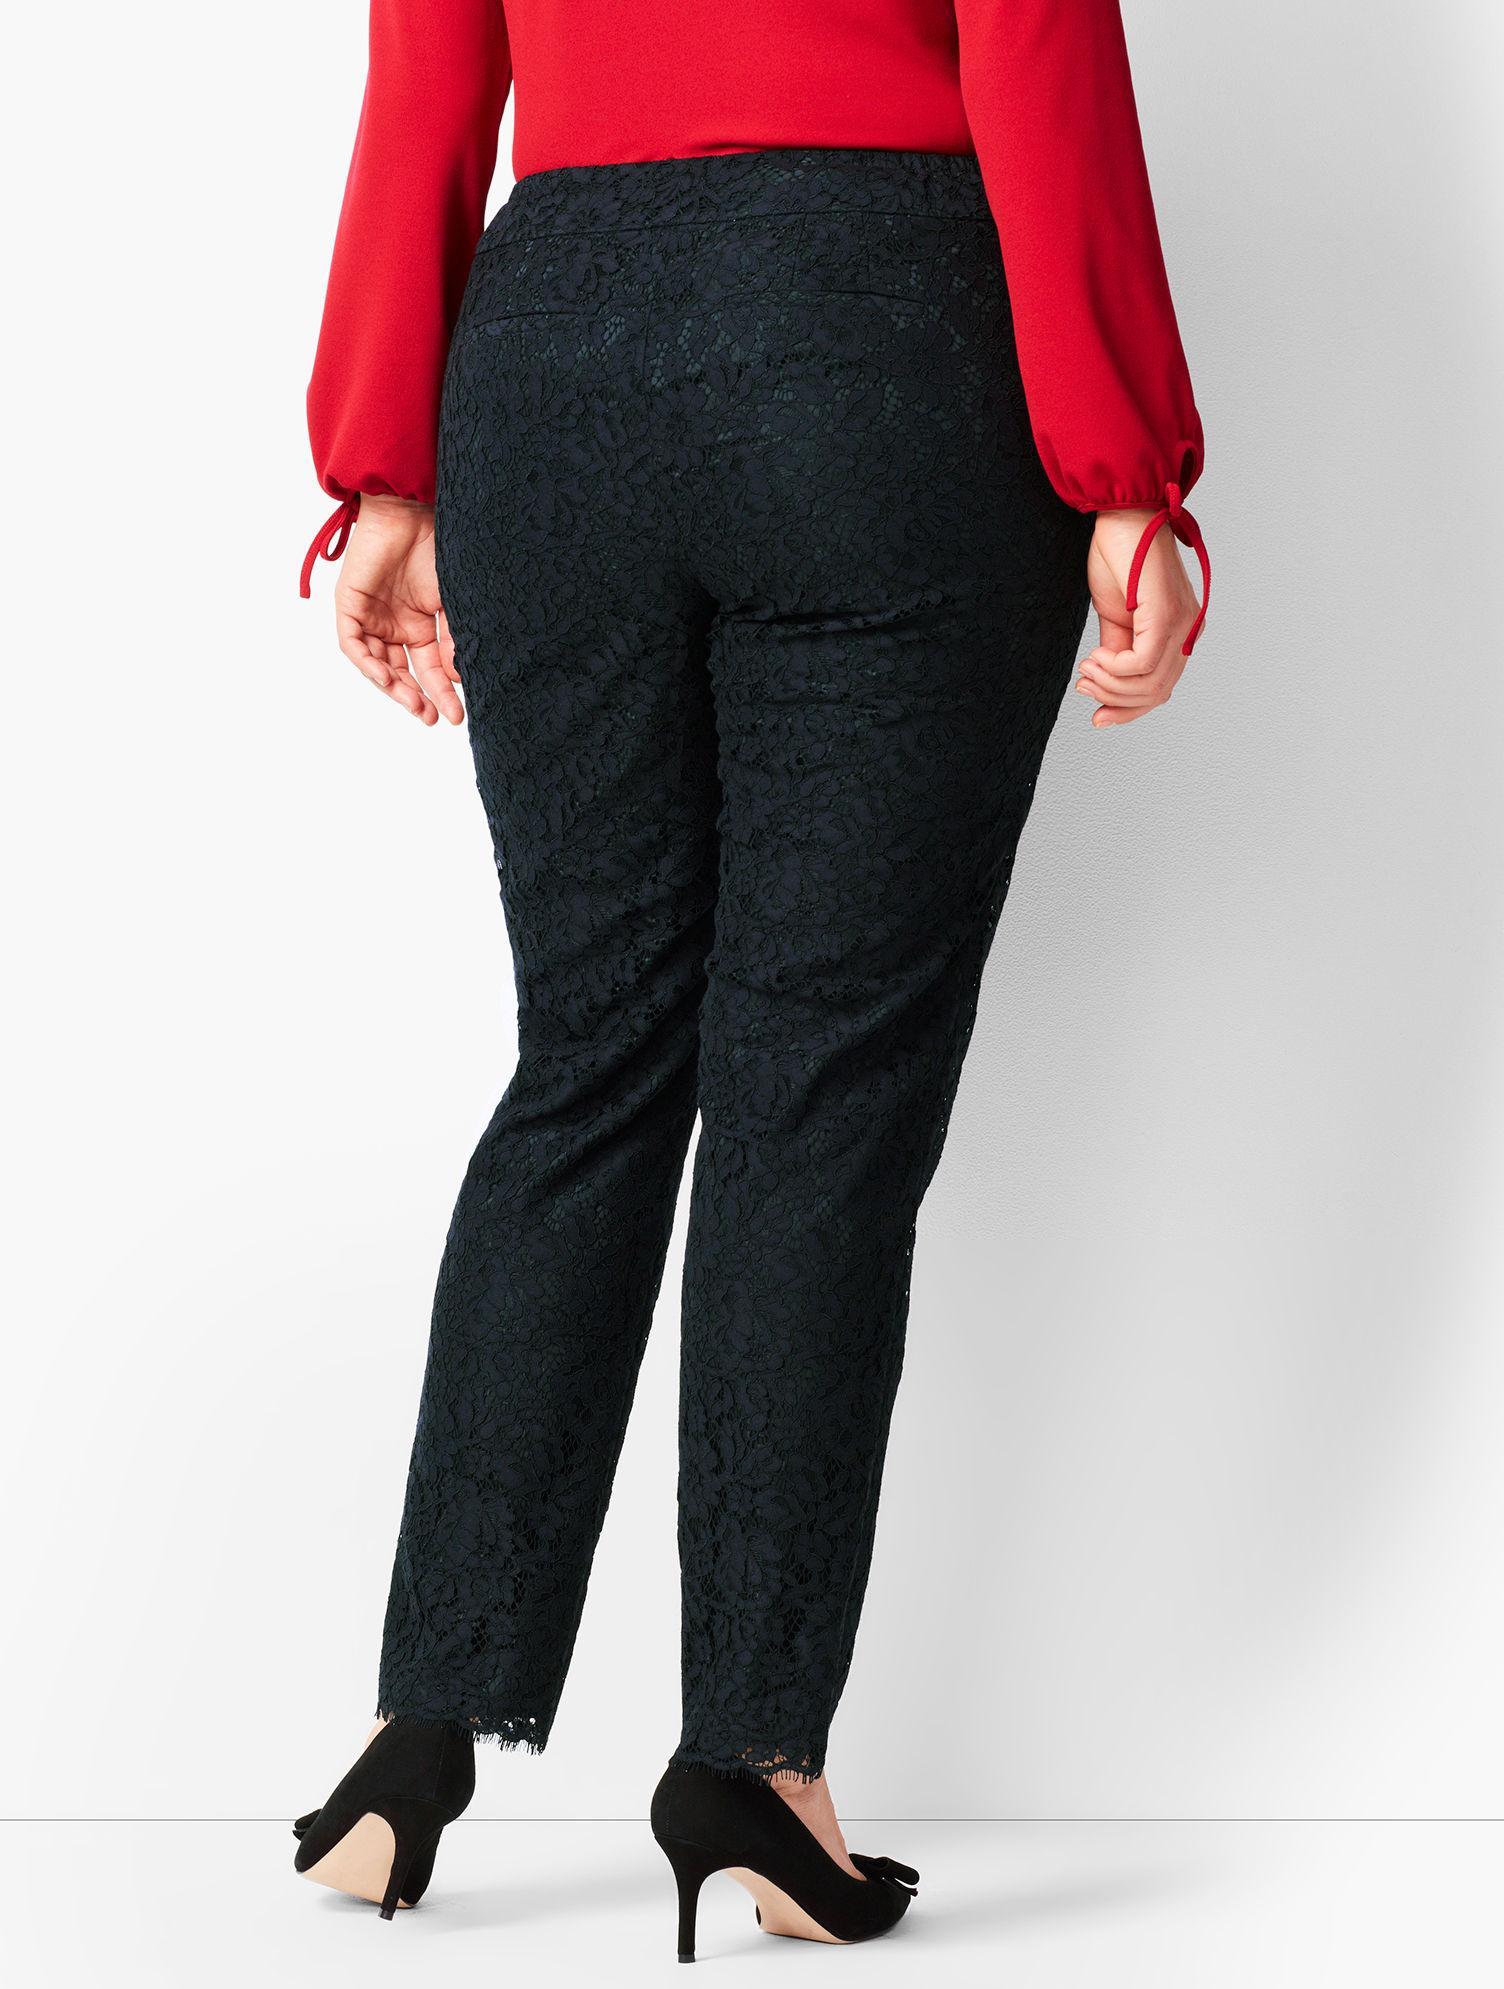 5d1571e09a Talbots - Black Plus Size Hampshire Ankle Pants - Lyst. View fullscreen